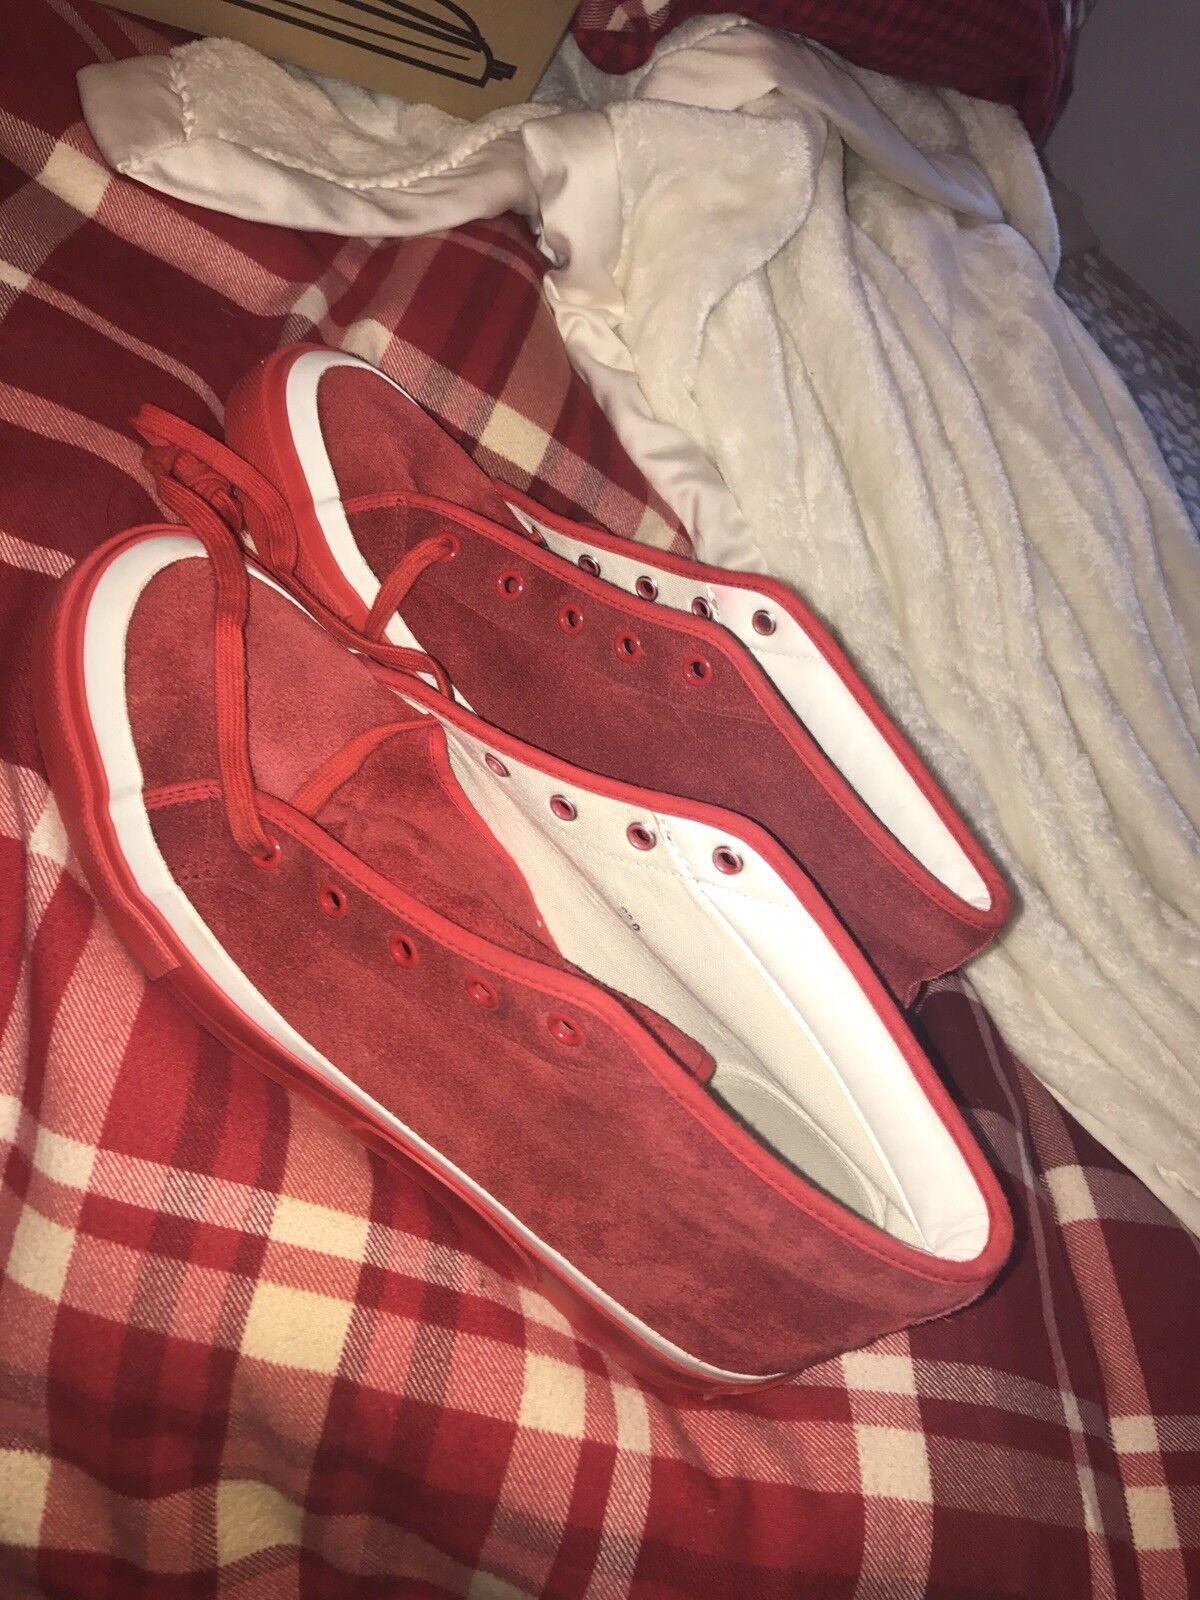 Billionaire garçons Club Chaussures RARE    Made in Japan rouge Original Pharrell 10.5